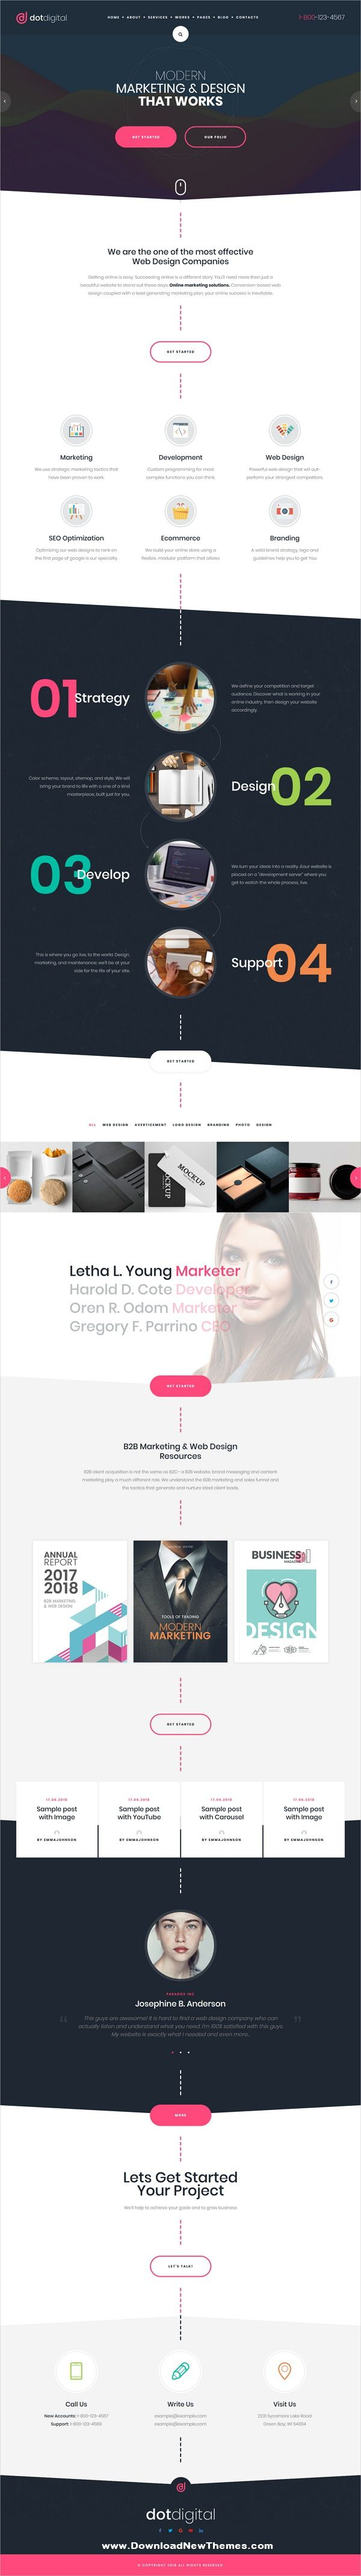 Dotdigital Web Design Agency Wordpress Theme